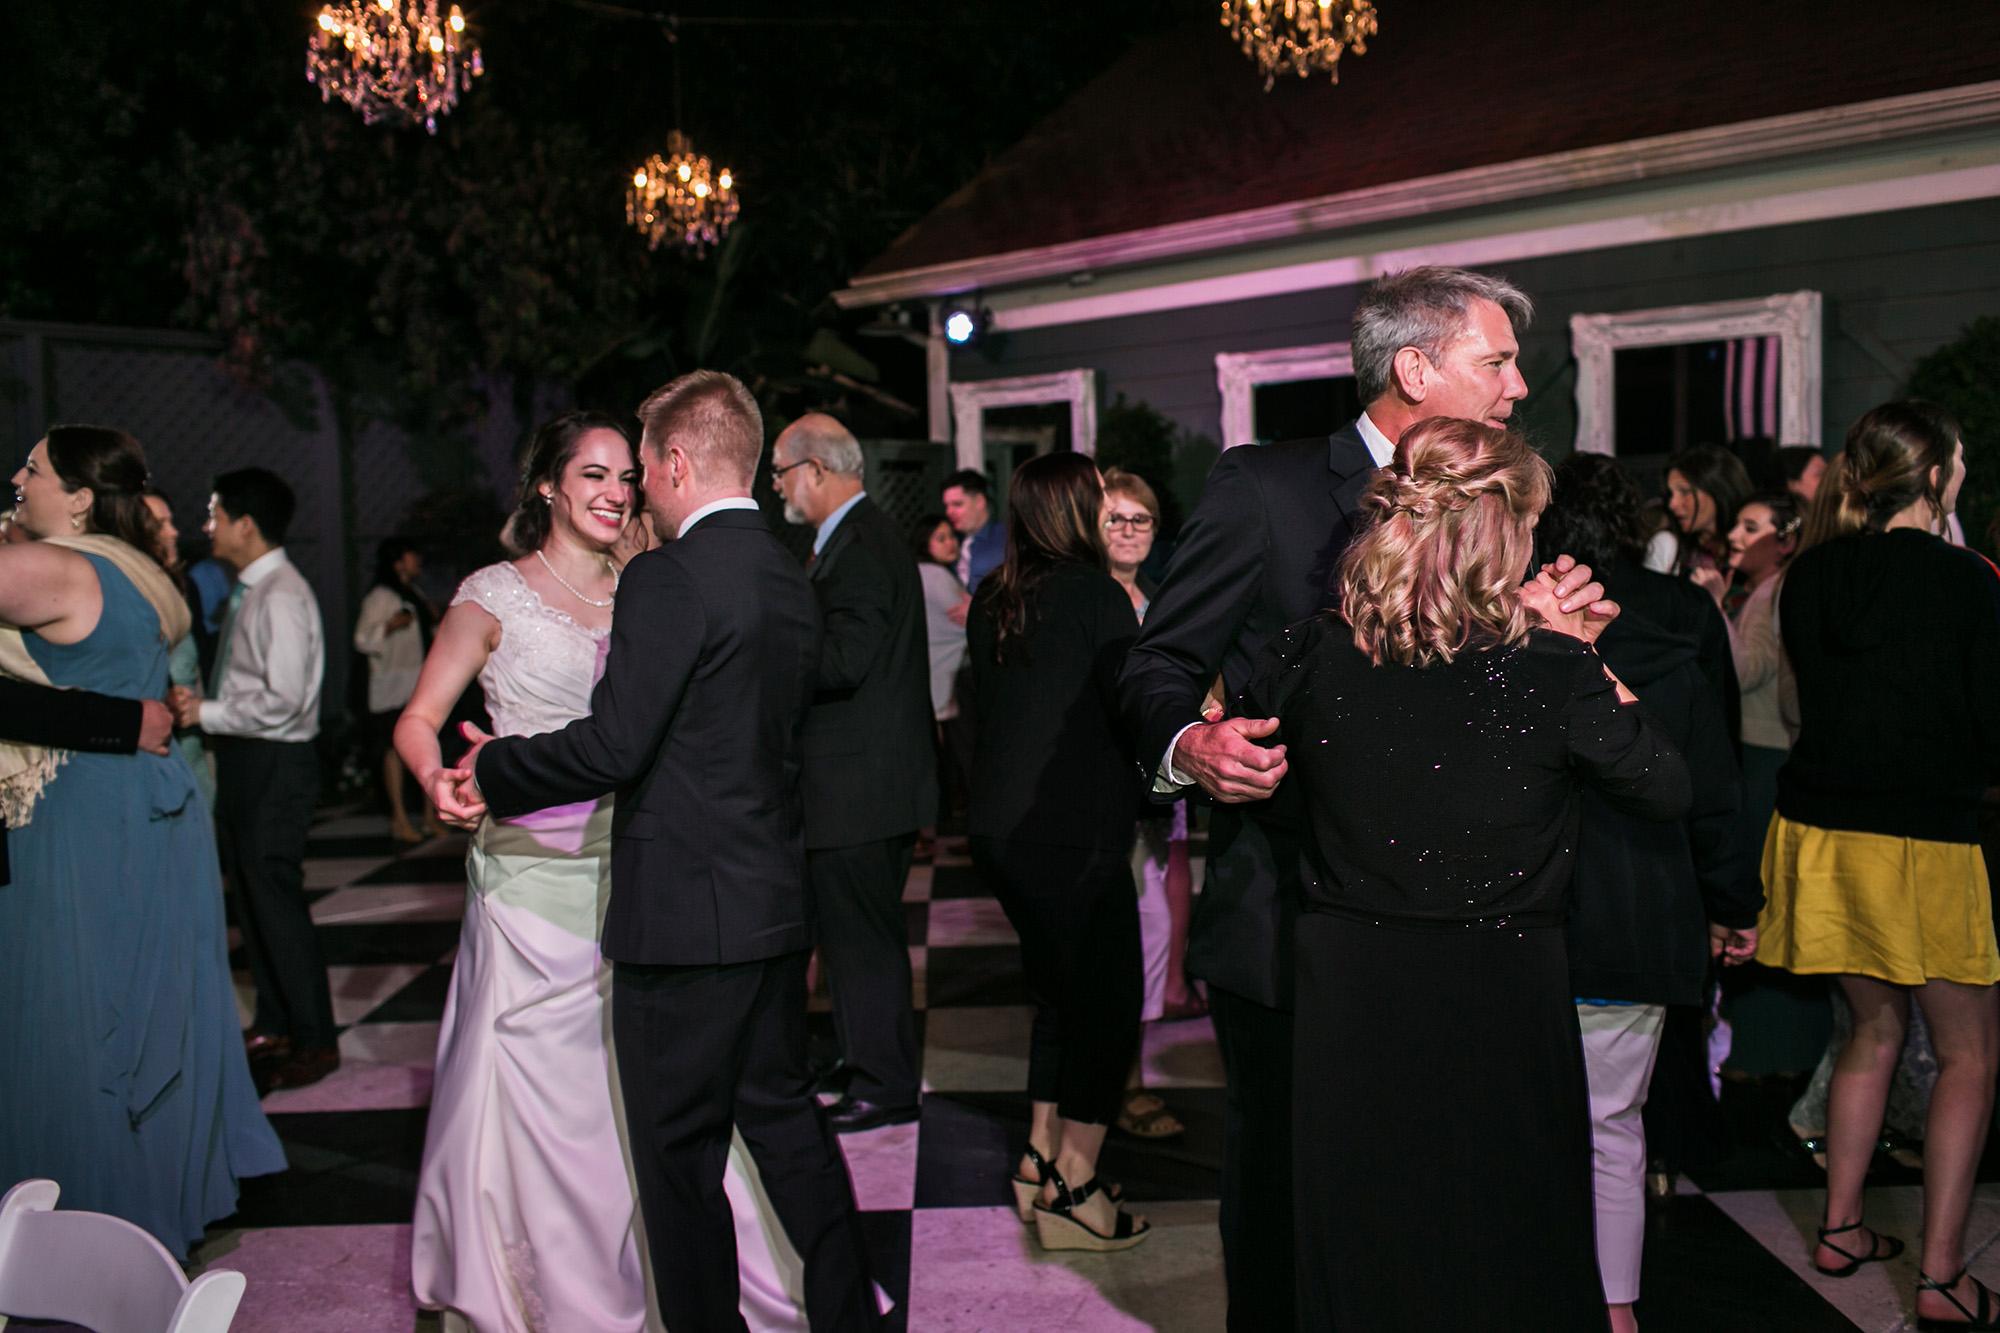 associate-photographer-christmas-house-wedding-carrie-vines-0028.jpg